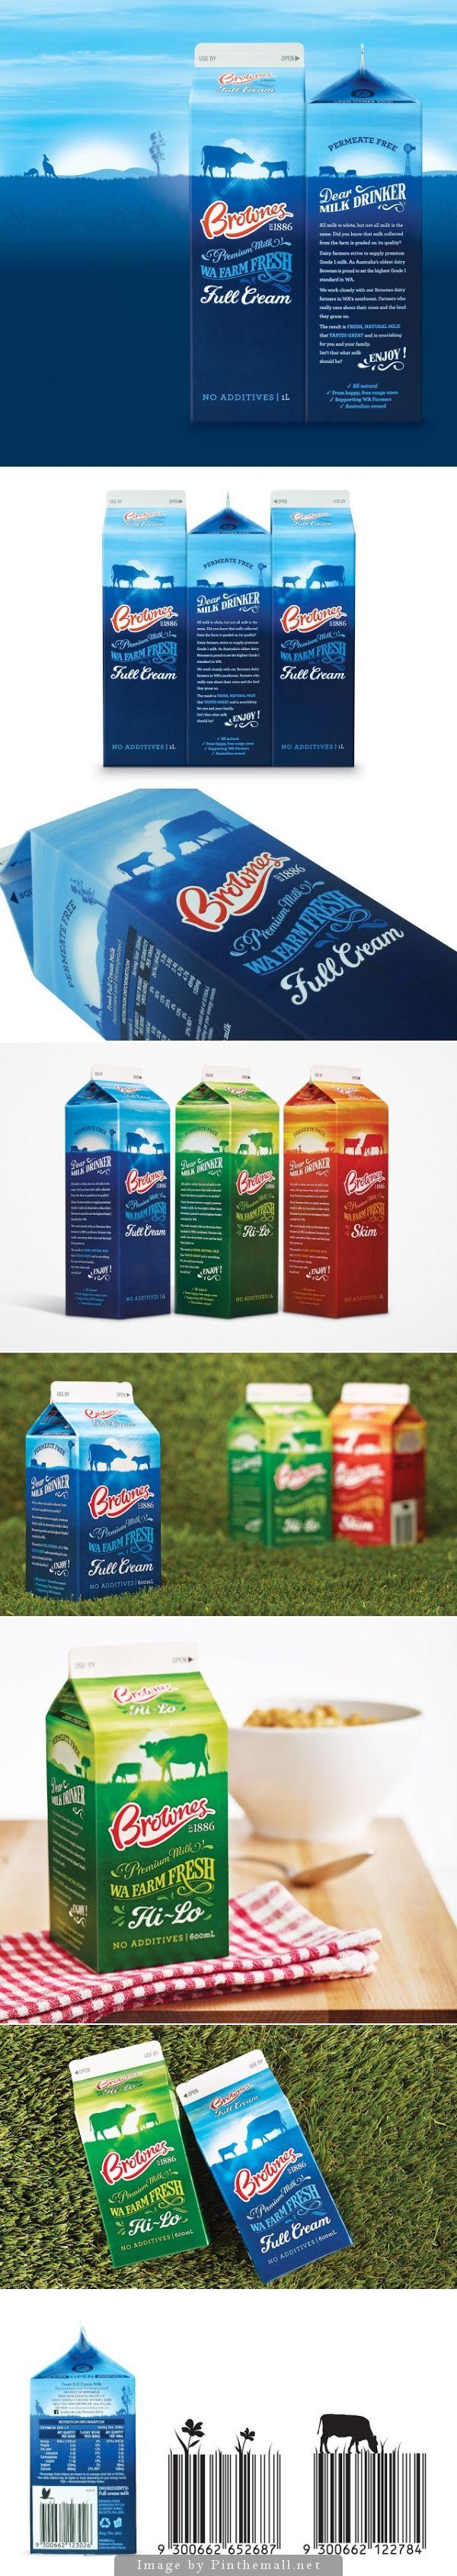 Brownes White #Milk by Boxer & Co. - http://www.packagingoftheworld.com/2014/11/brownes-white-milk.html